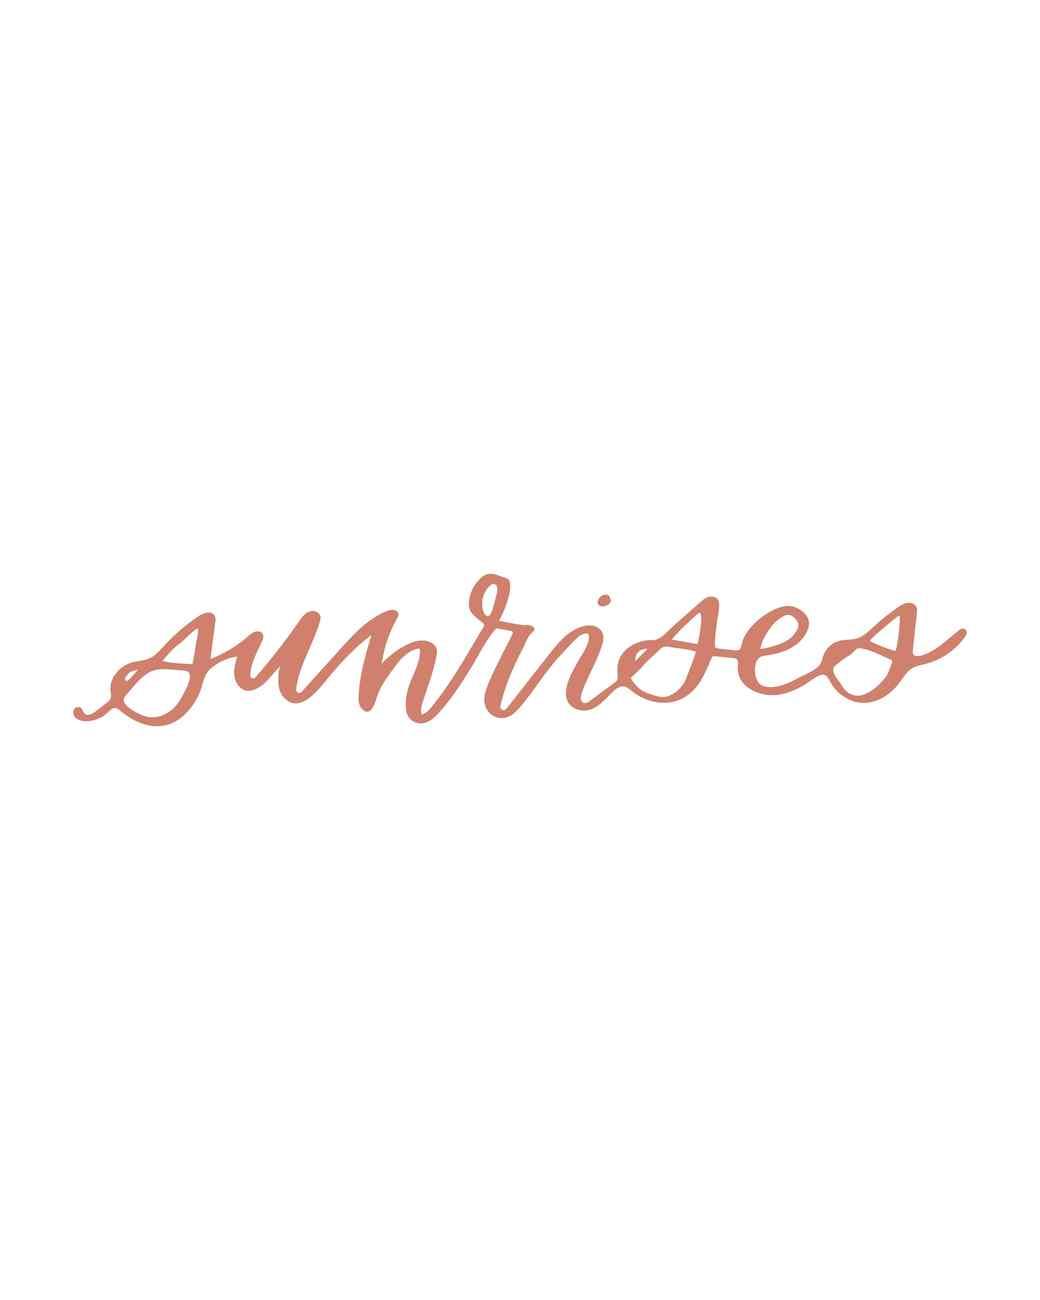 """sunrises"" calligraphy"